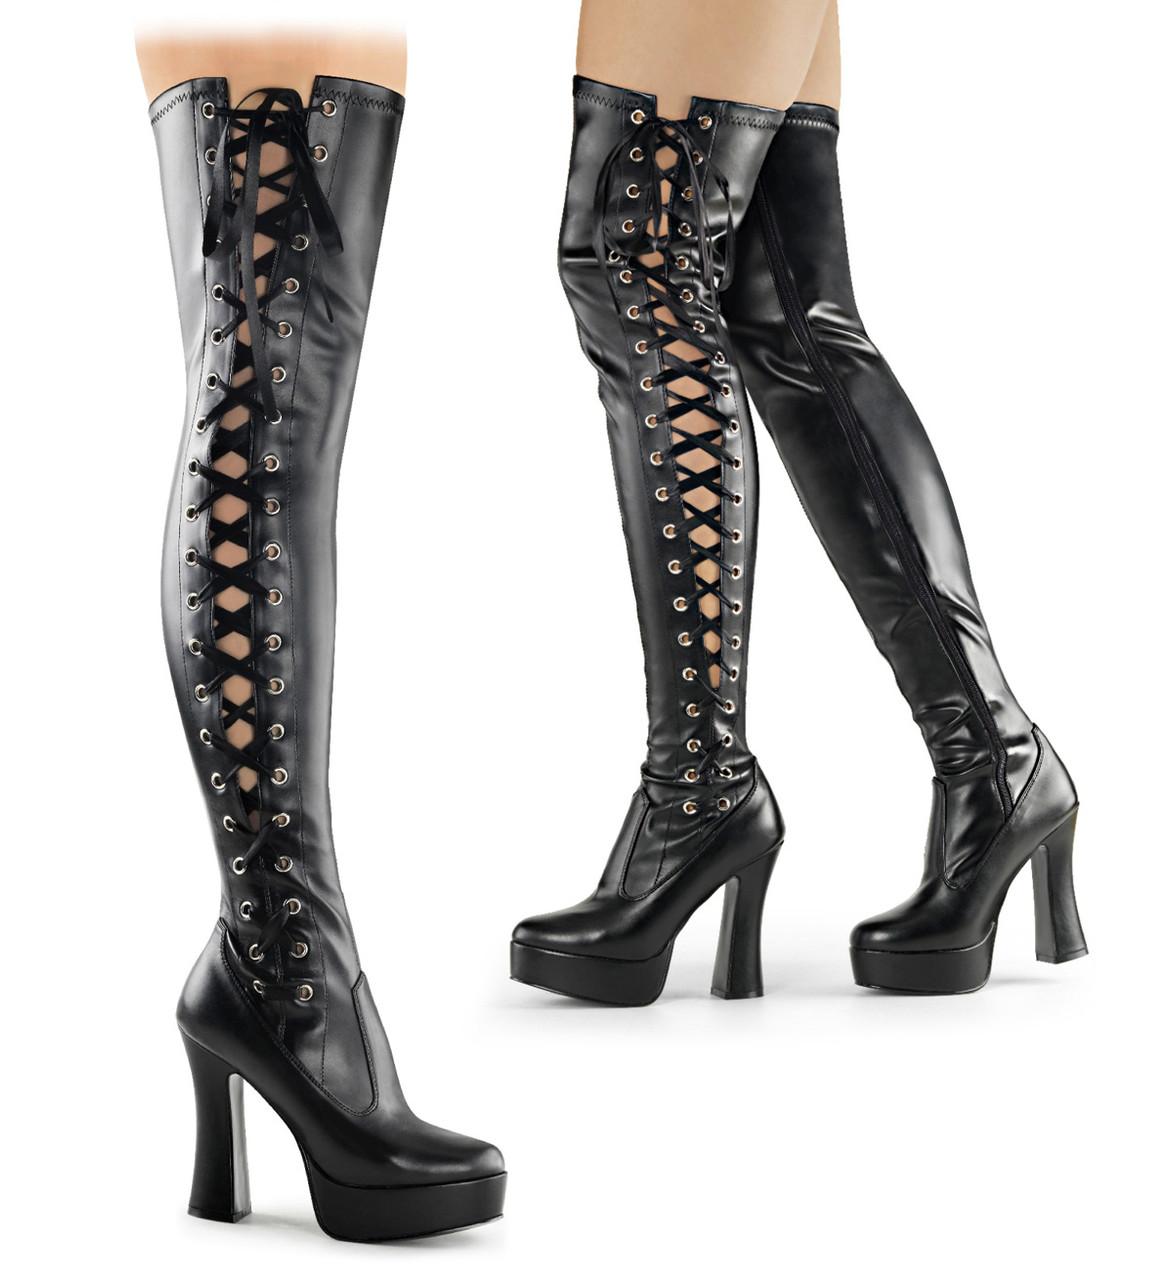 5 Inch Platform Thigh High Boots